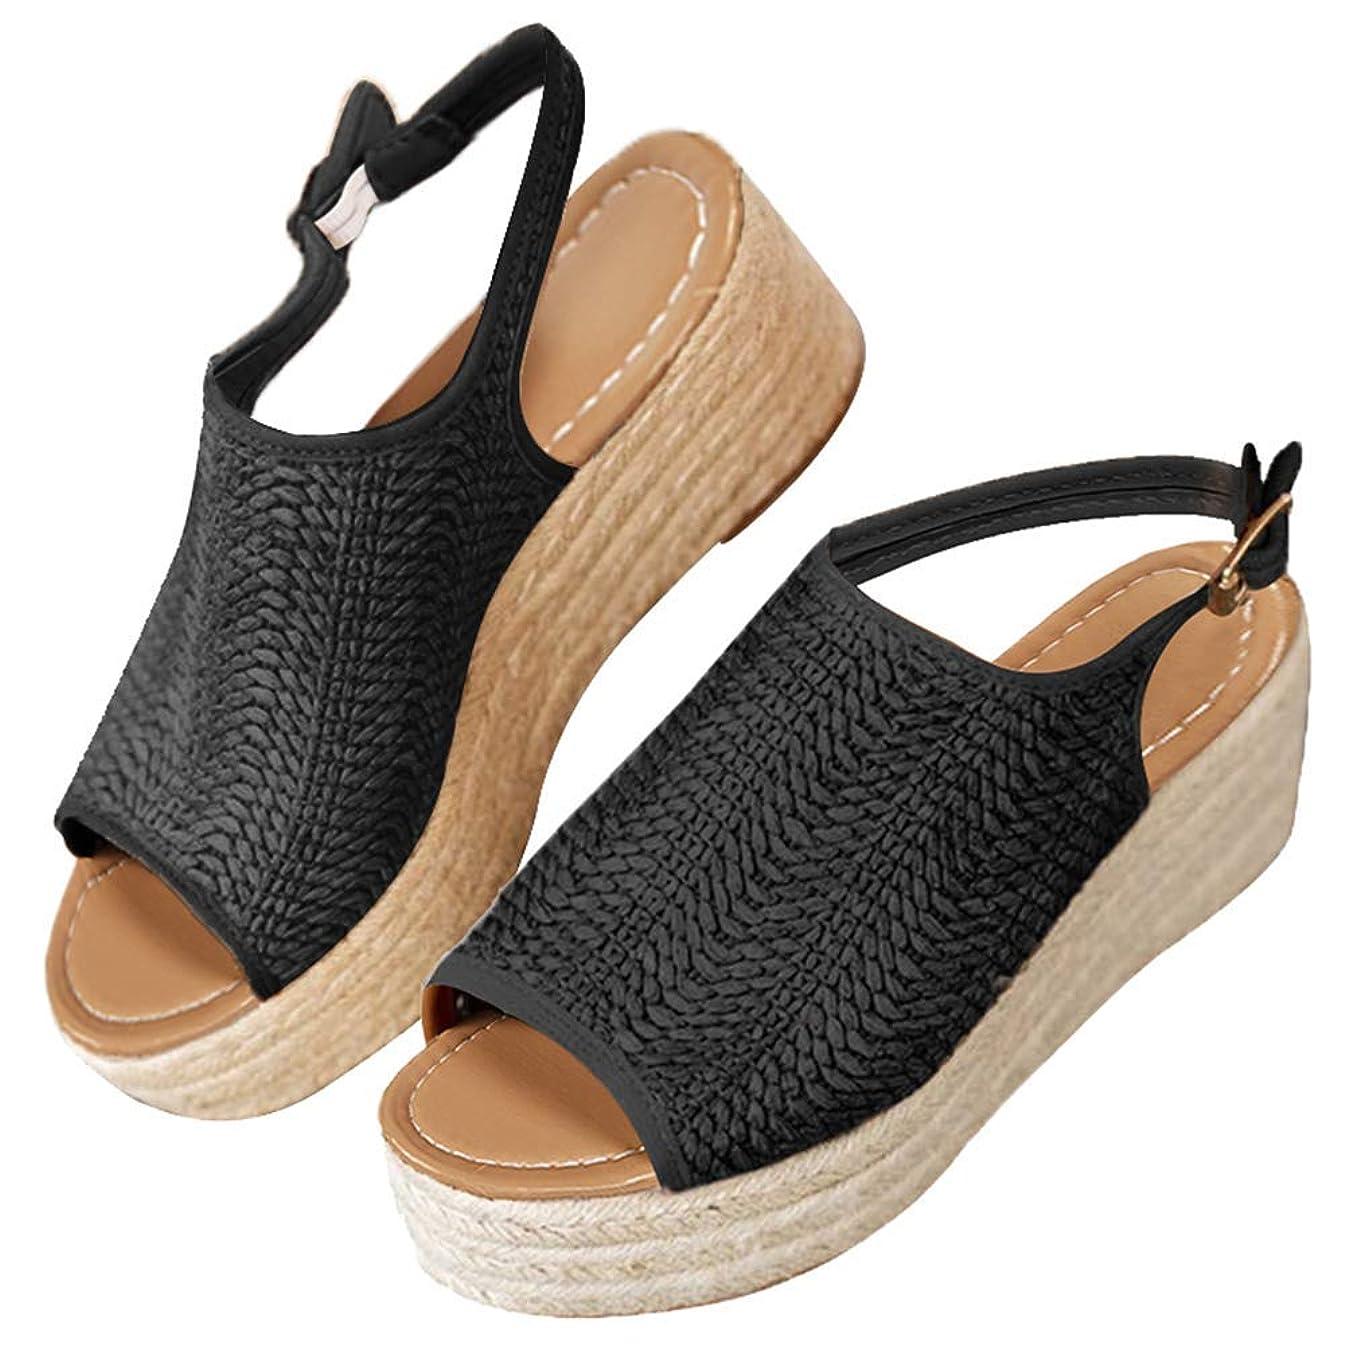 Women's Espadrilles Wedge Sandals Open Toe Summer Mid Heel Platform Sandals Ankle Straps Buckle Flat Sandals